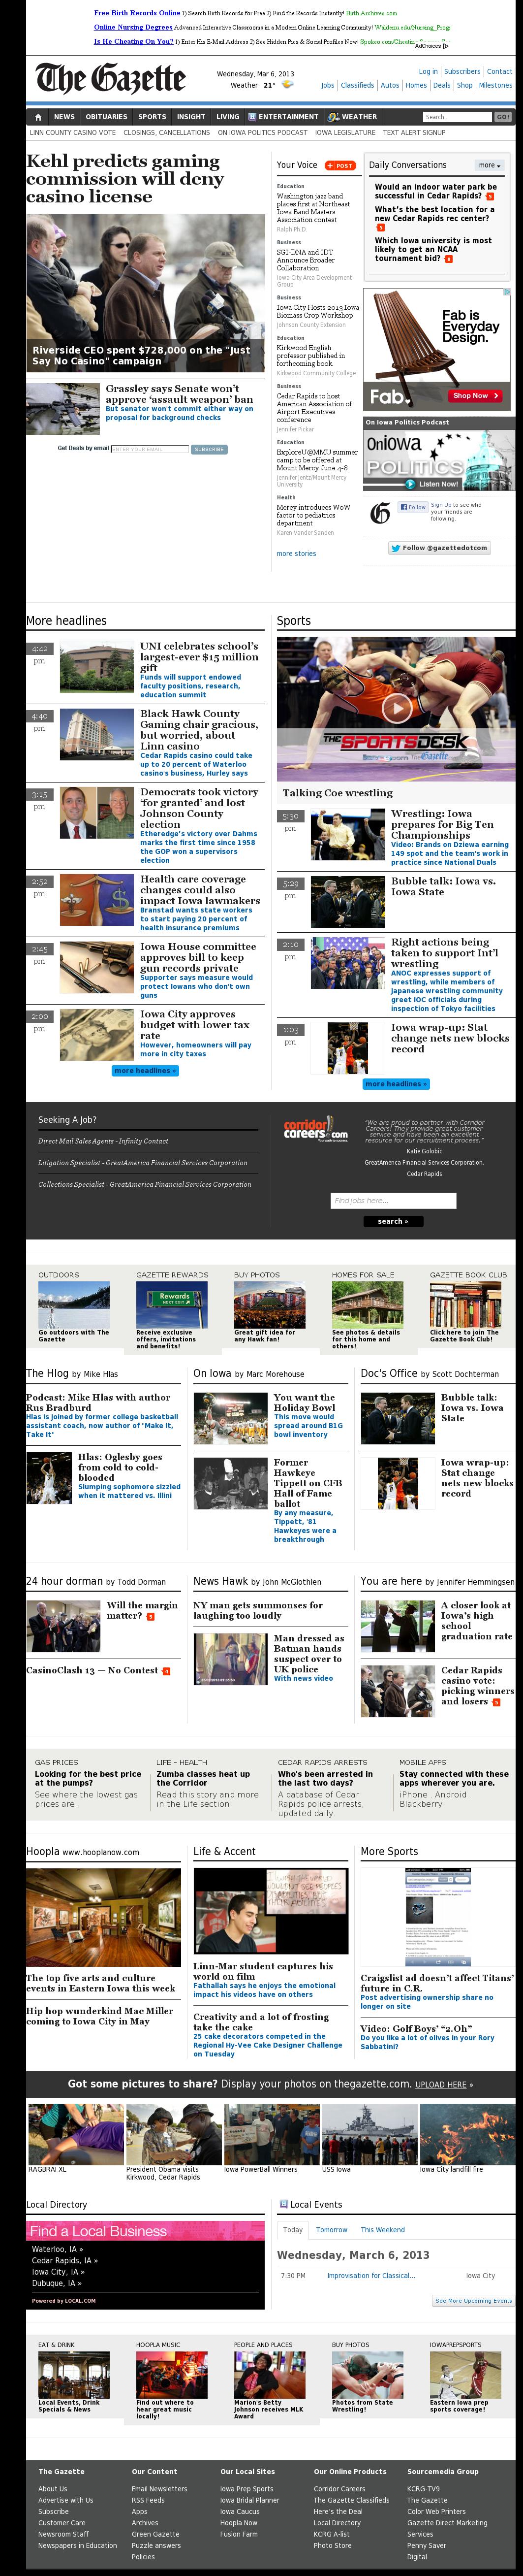 The (Cedar Rapids) Gazette at Thursday March 7, 2013, 1:06 a.m. UTC